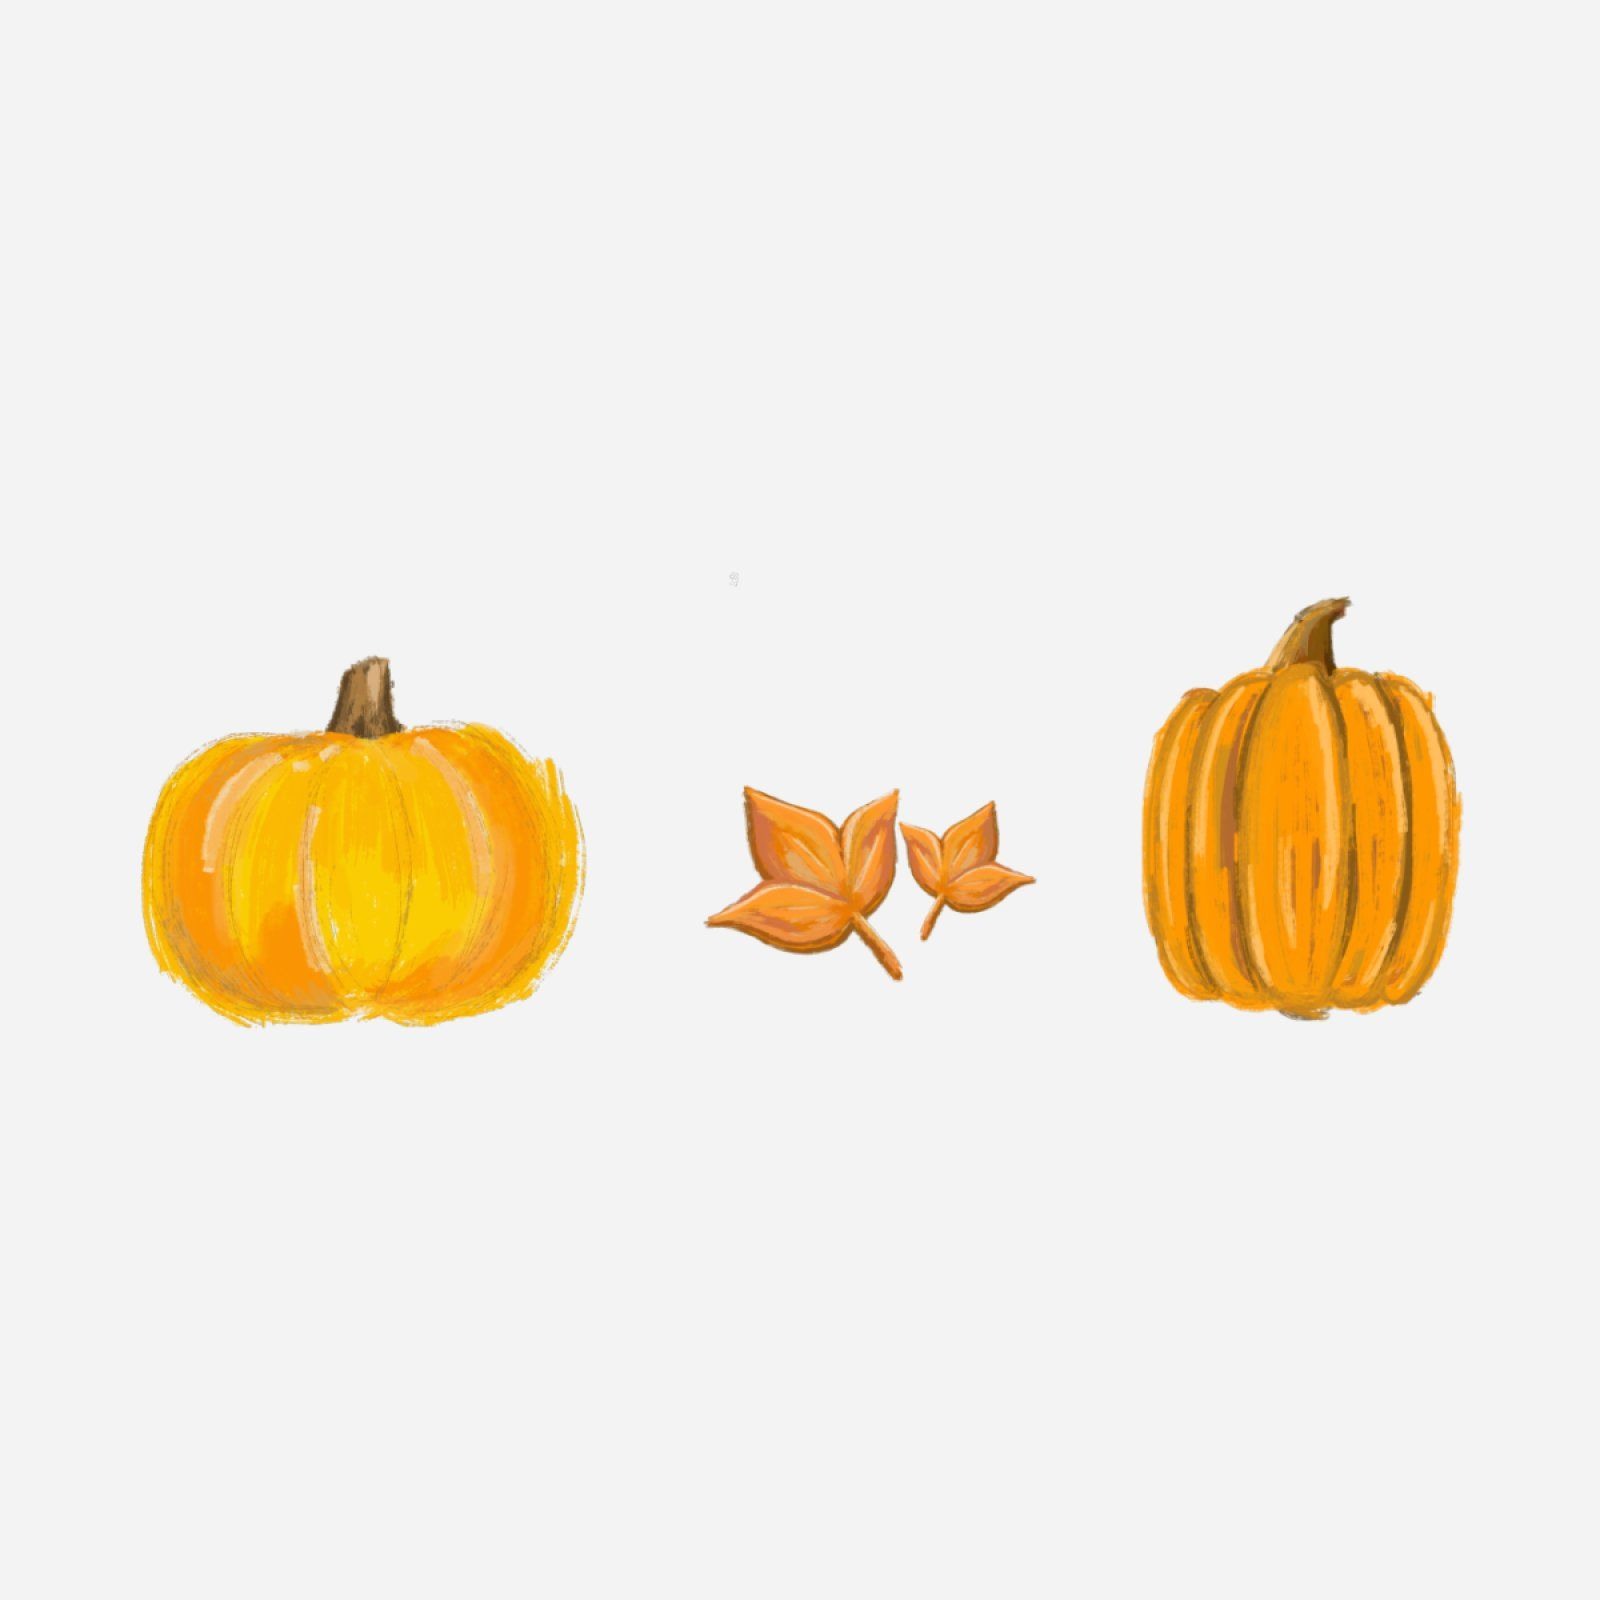 Pumpkin Leaf And Pumpkin In 2020 Cute Fall Wallpaper Fall Wallpaper Halloween Wallpaper Iphone